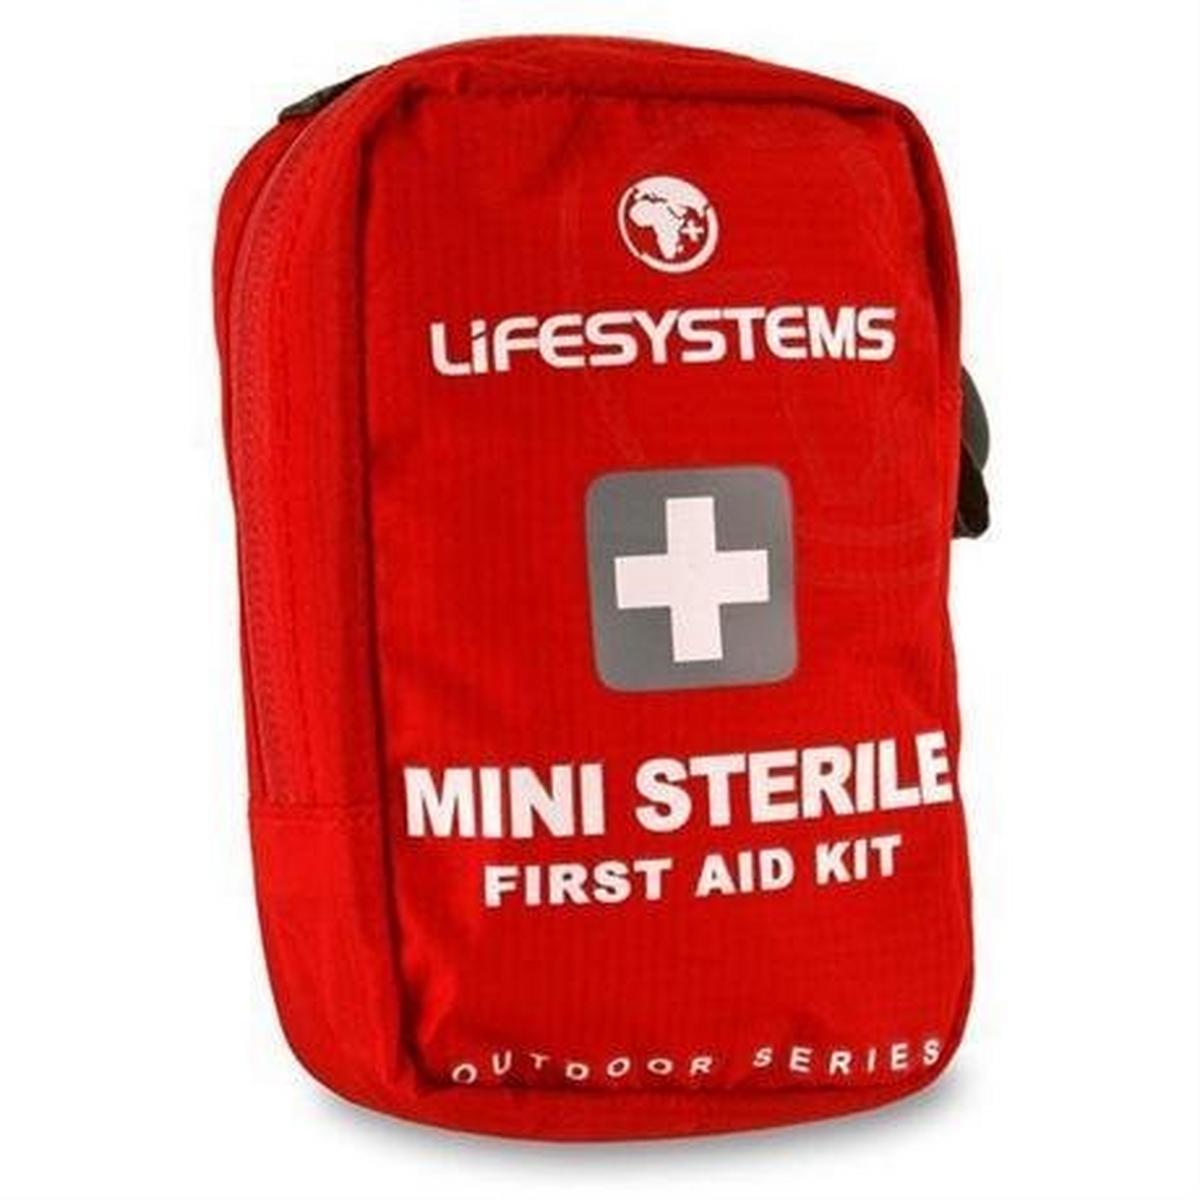 Lifesystems First Aid Mini Sterile Kit